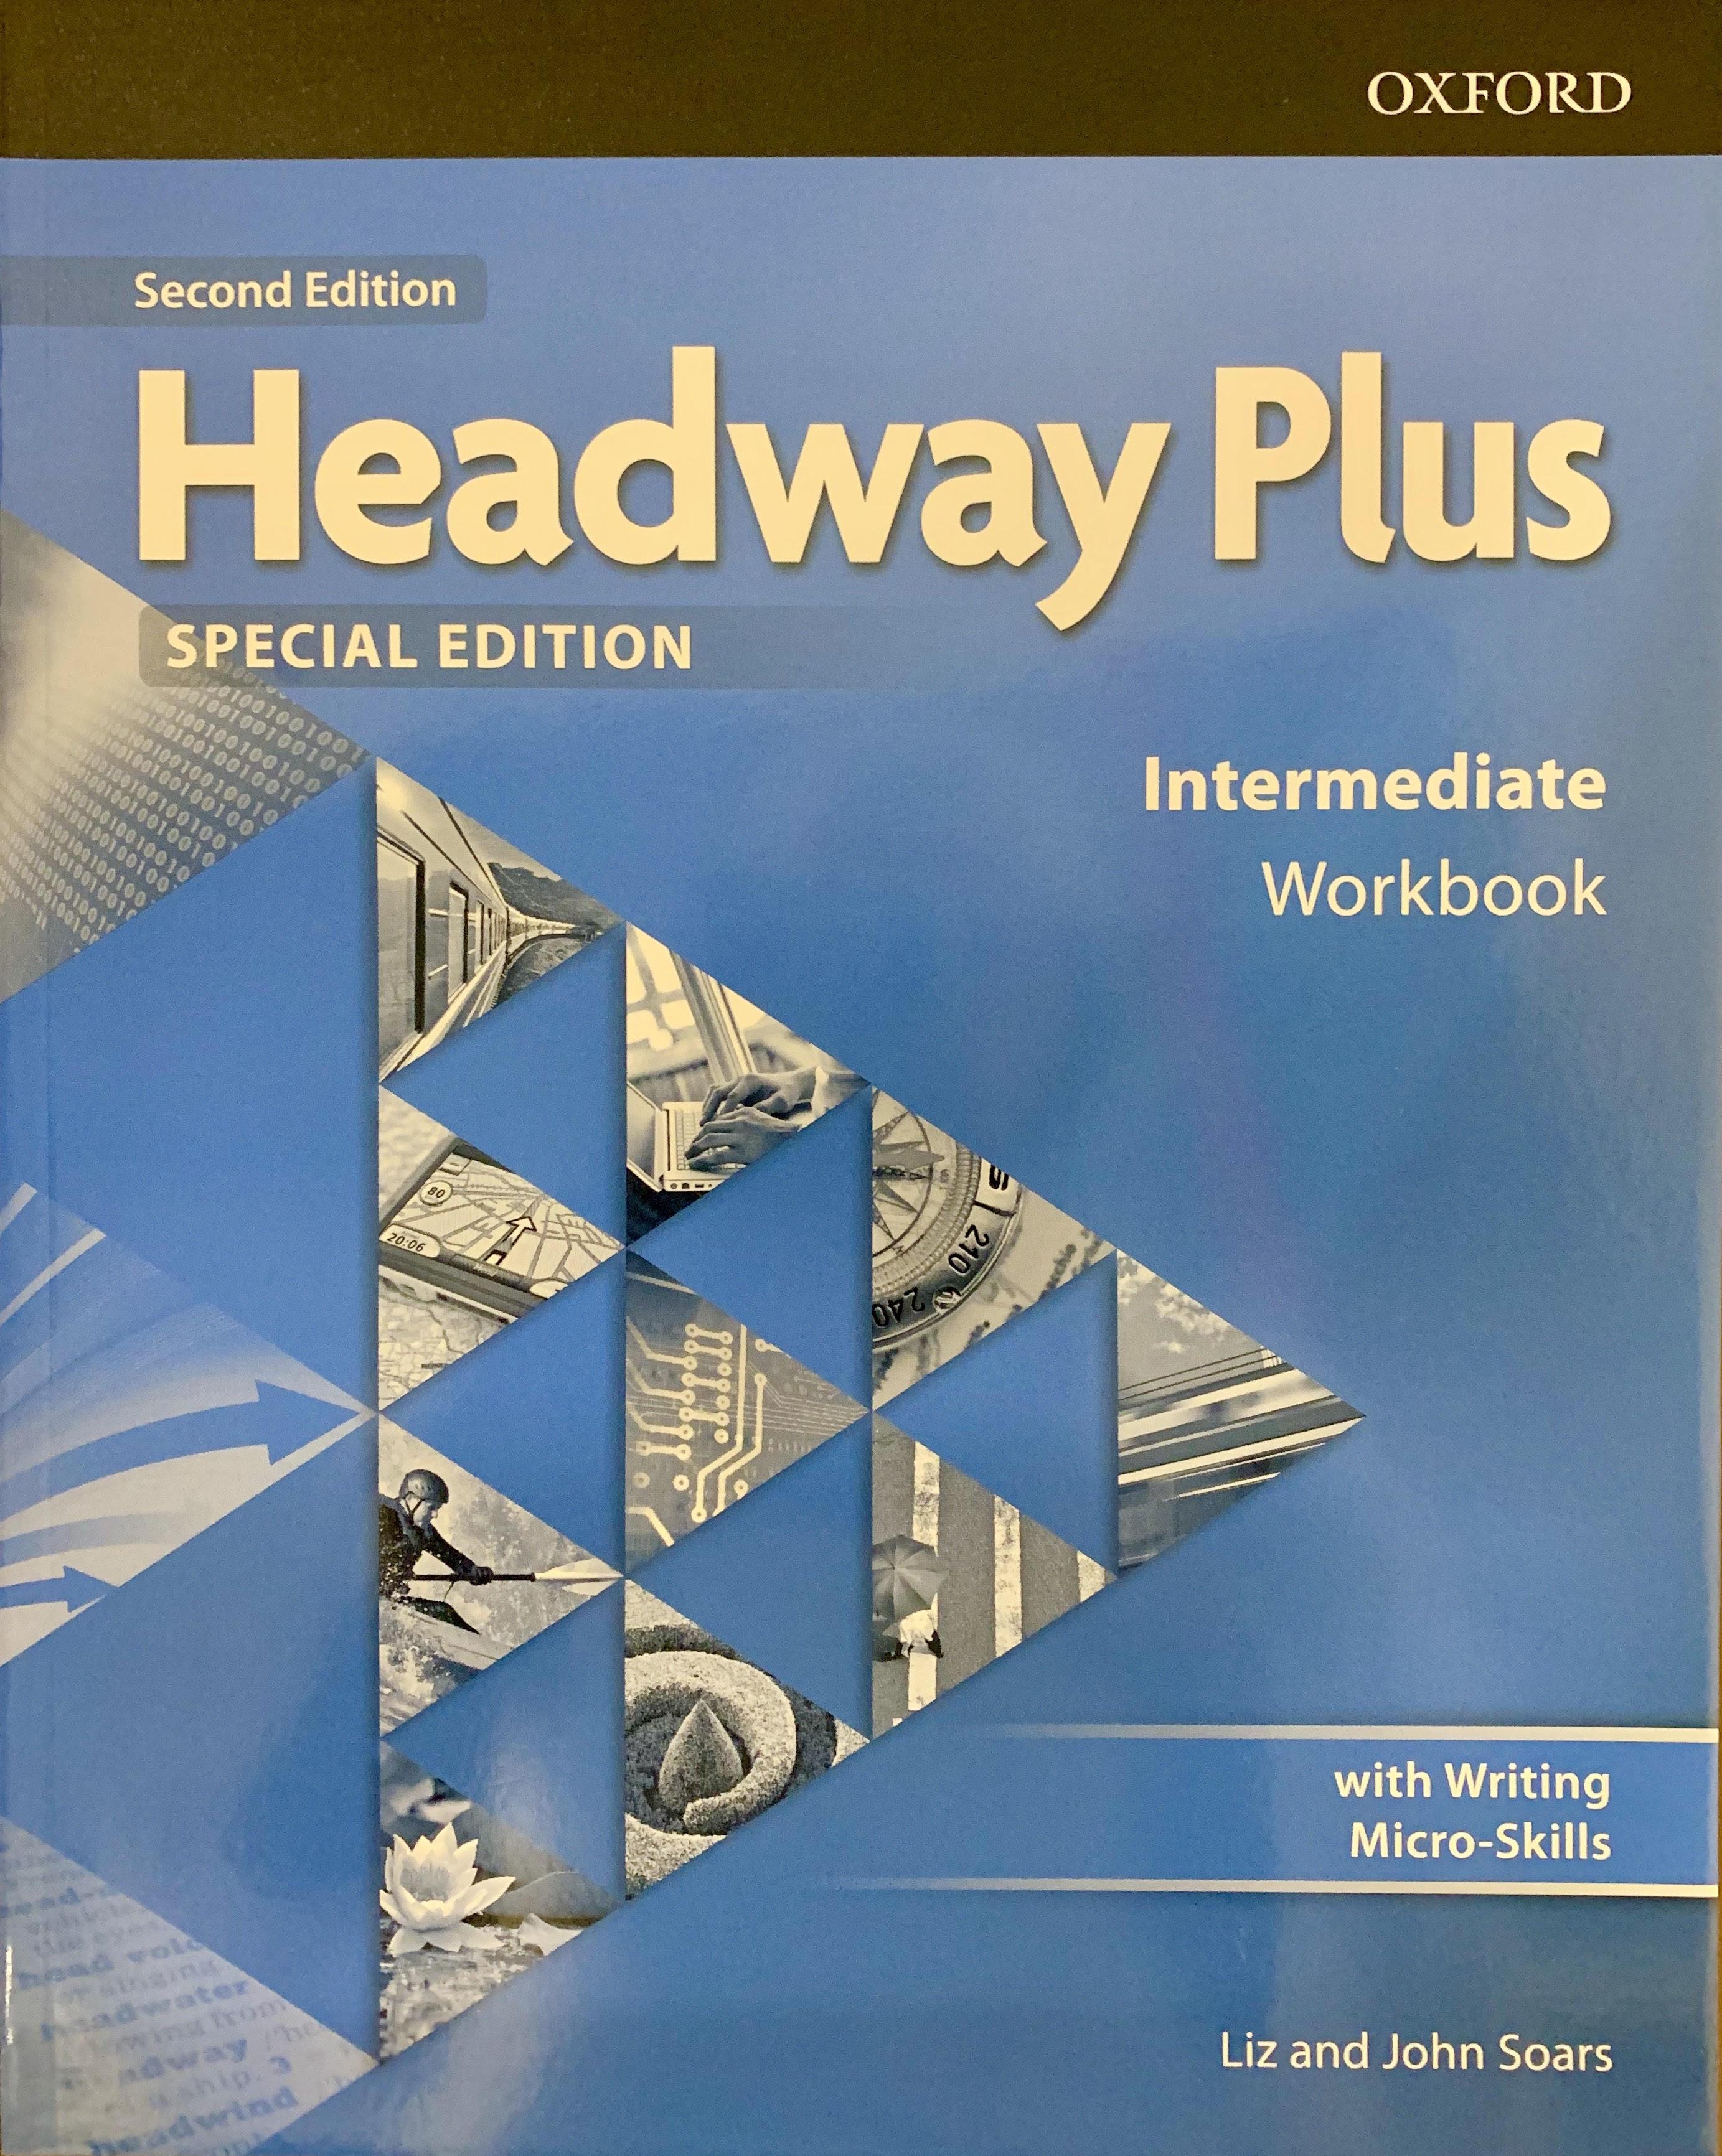 Headway Plus Intermadiate Work ( Second Edition )